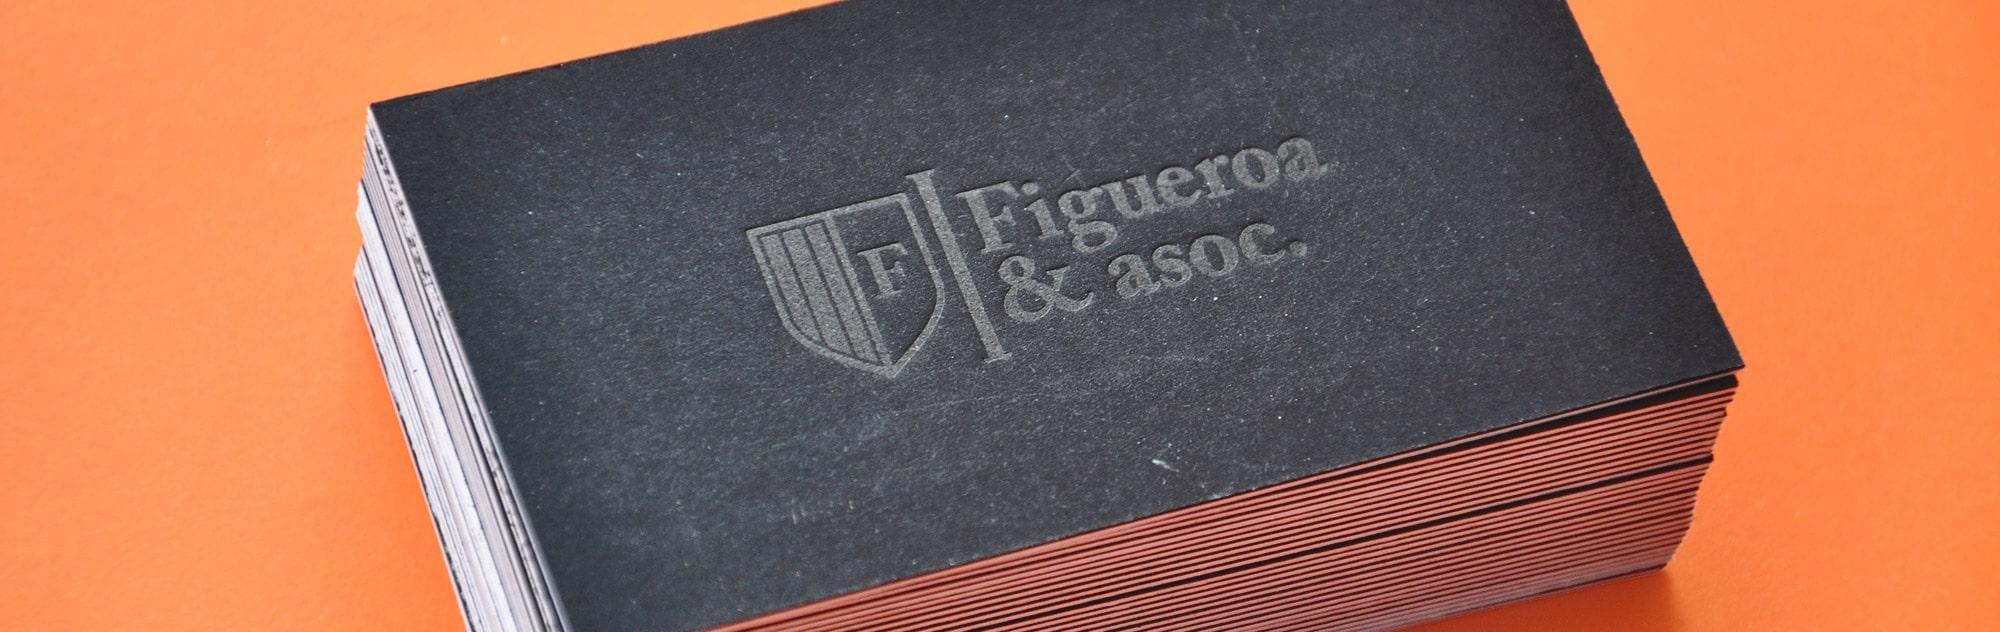 Figueroa & Asoc.